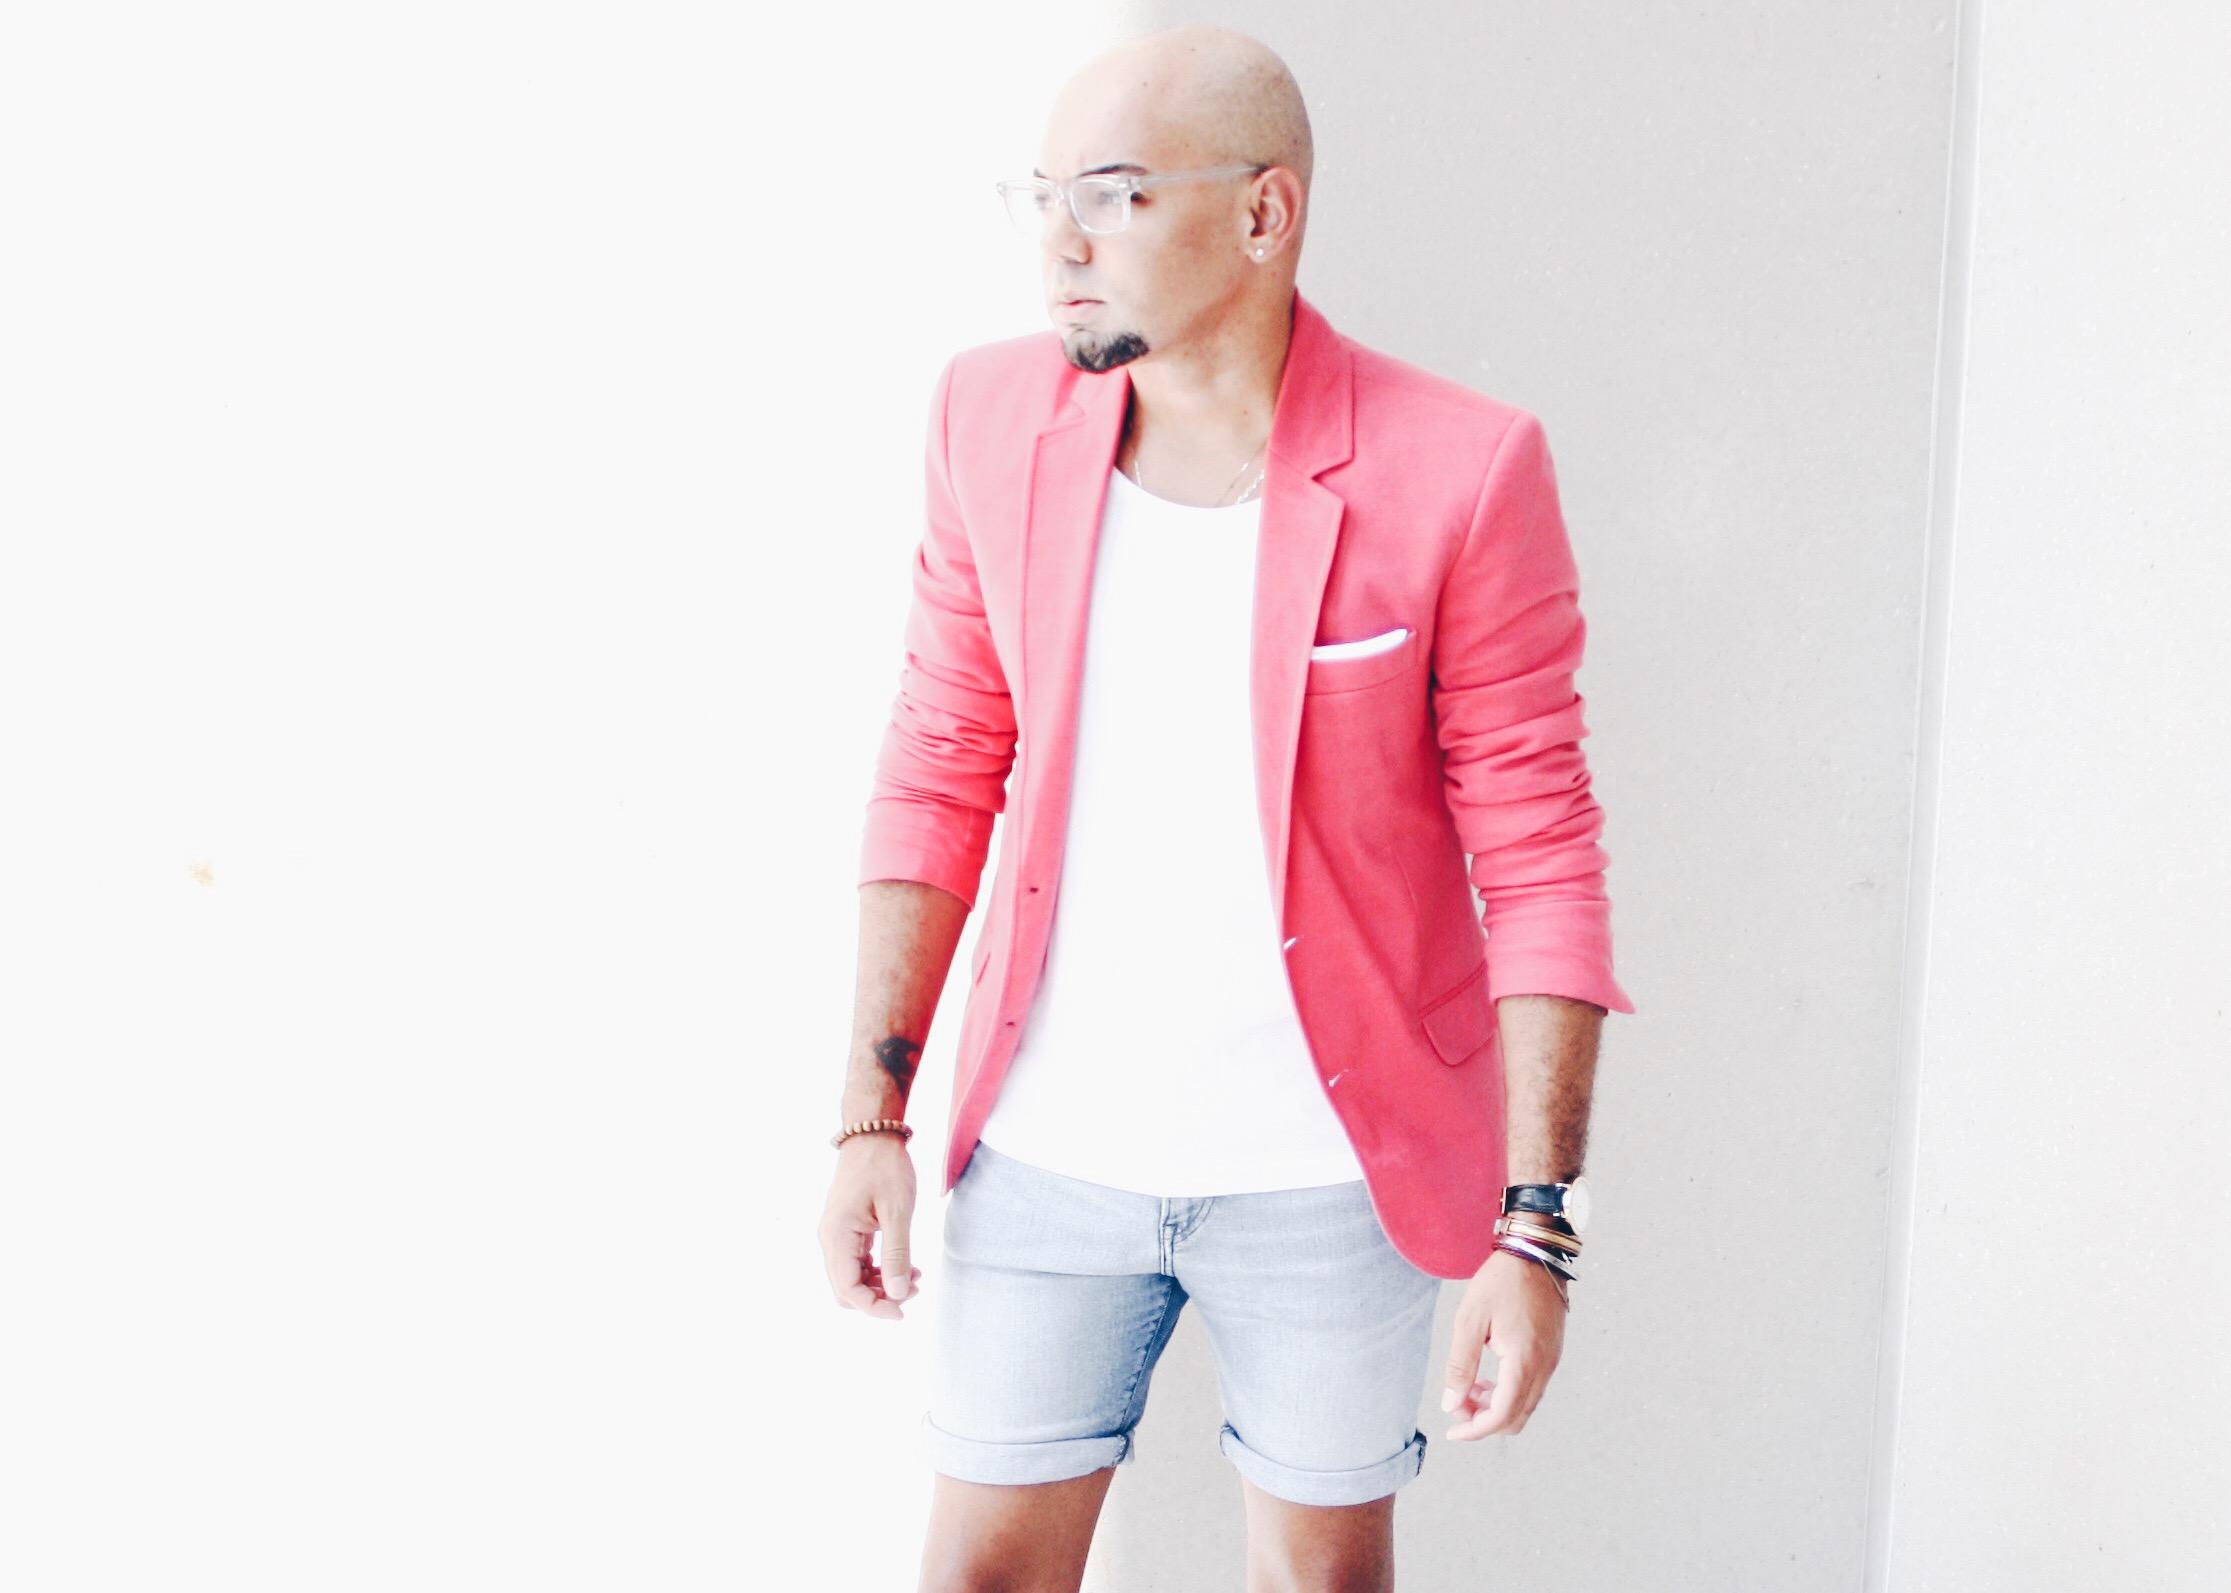 sam-c-perry-pink-blazer-navy-blue-loafer-cropped-body.jpg